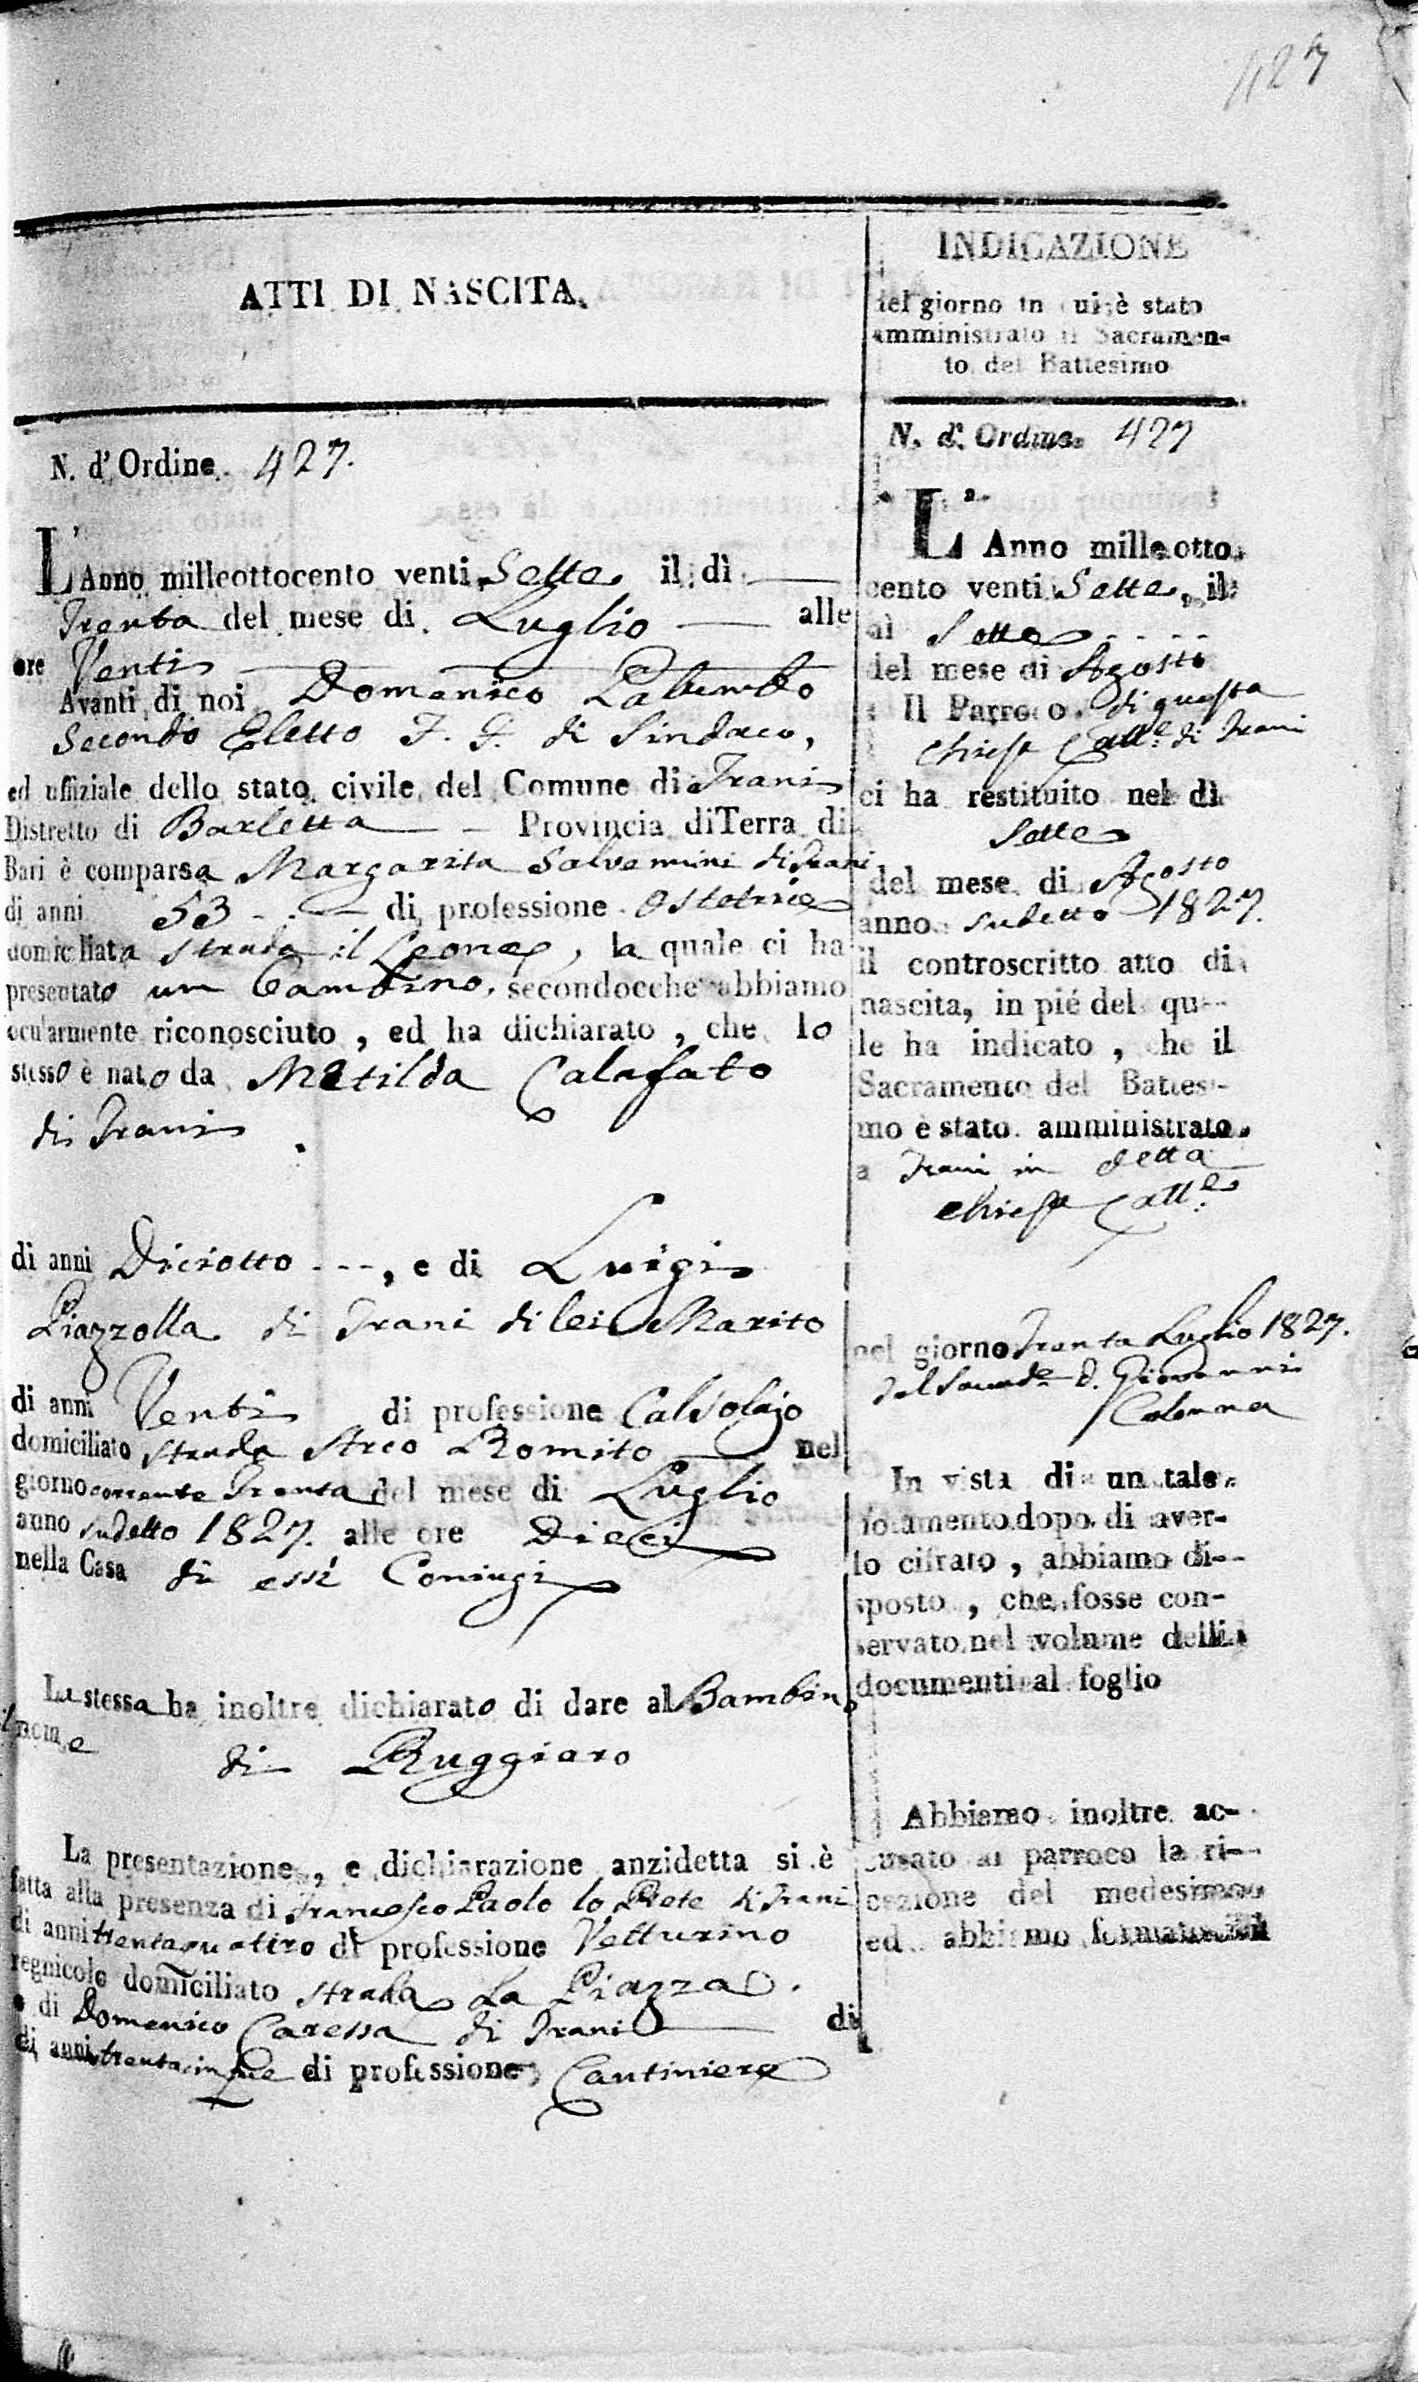 http://www.genealogiafamiliare.it/wp/wp-content/uploads/2018/03/Ruggero-Piazzolla-1827_1.jpg